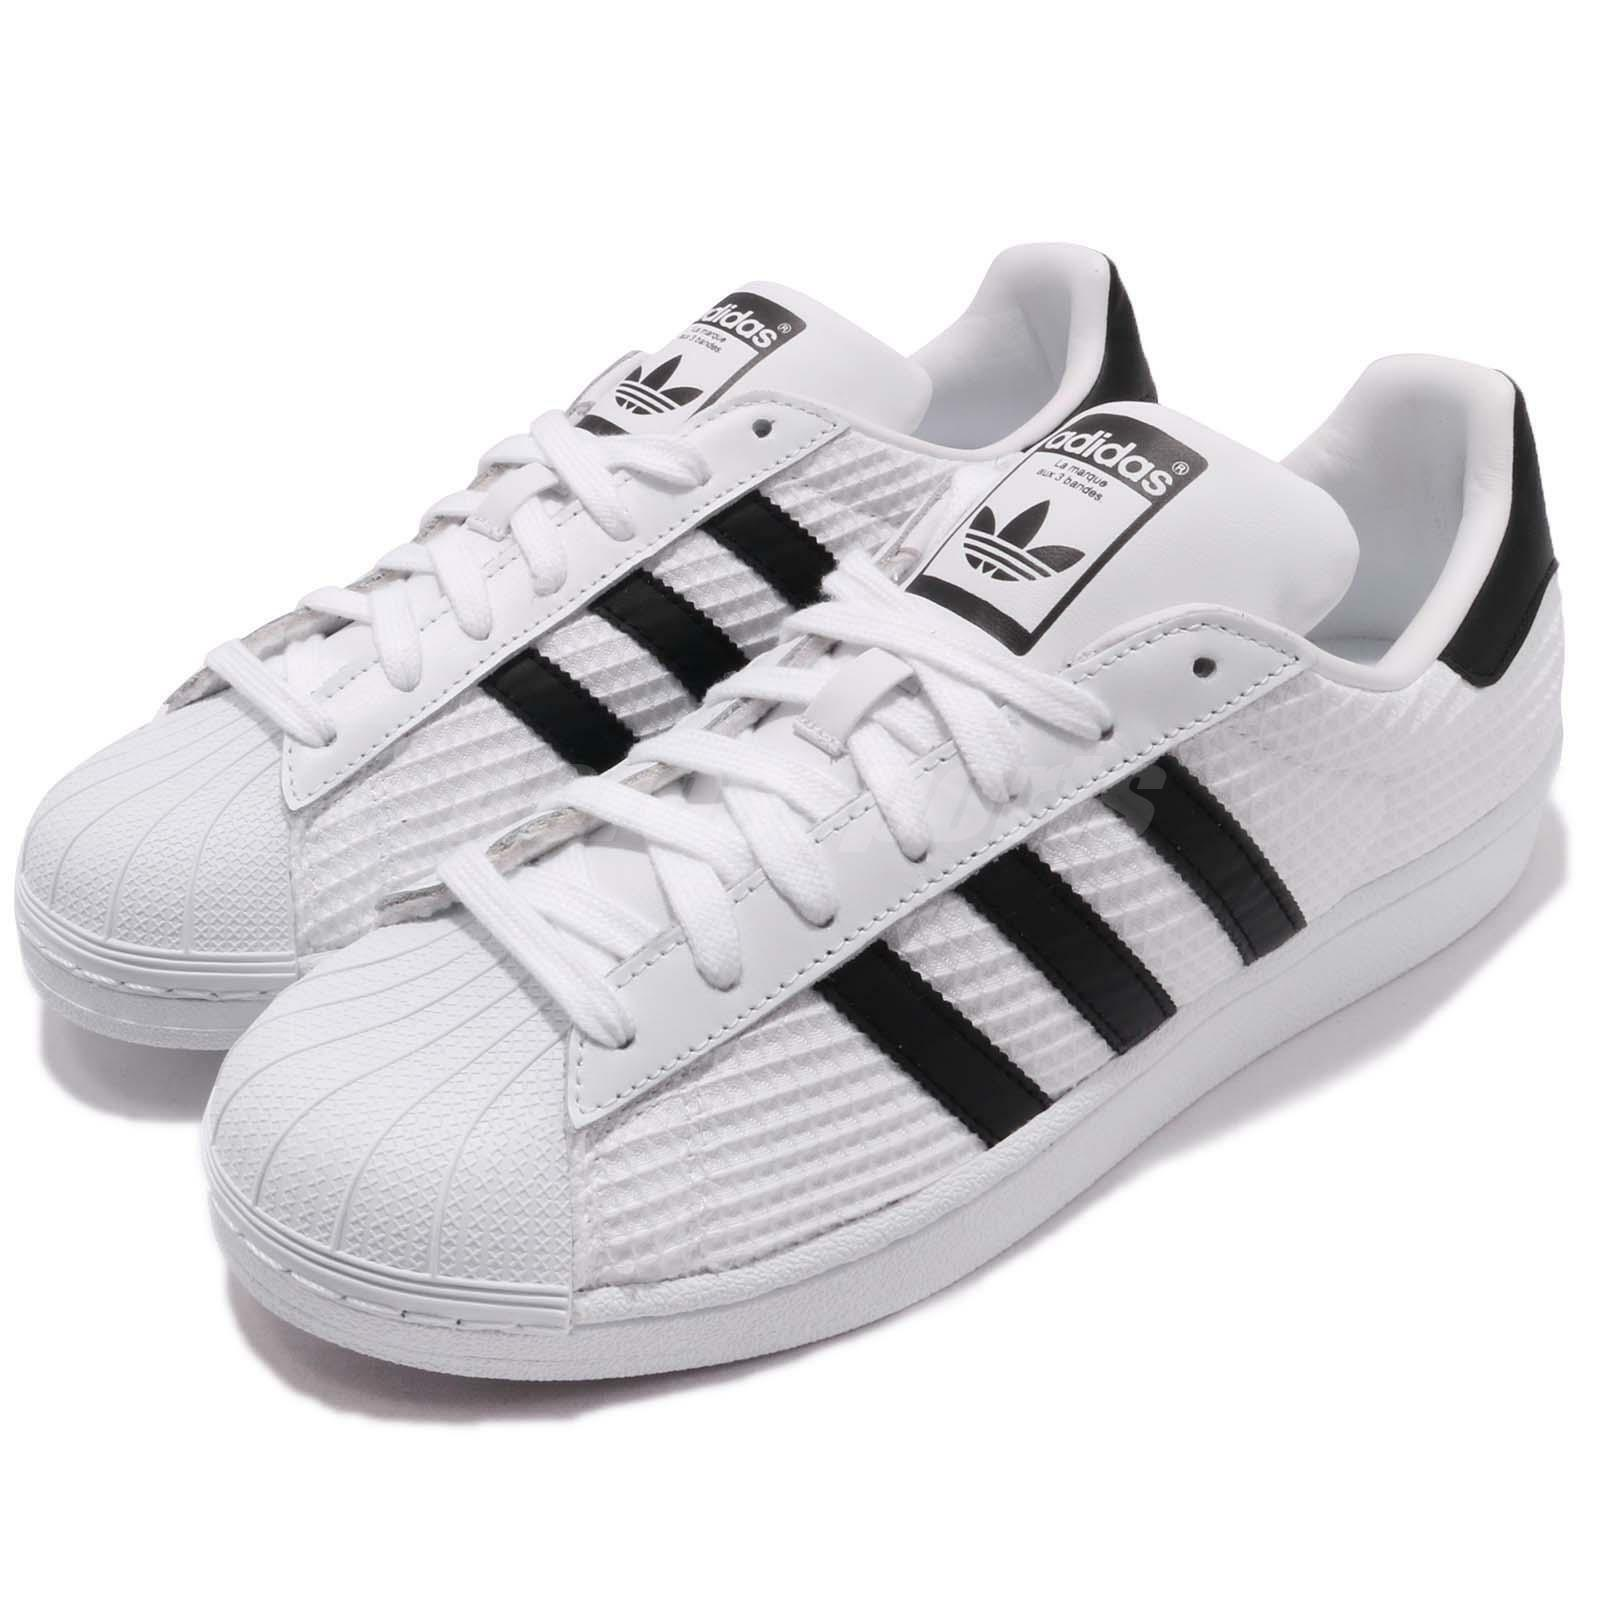 adidas Originals Superstar Footwear blanc Core Noir hommes Casual Shoes CM8077